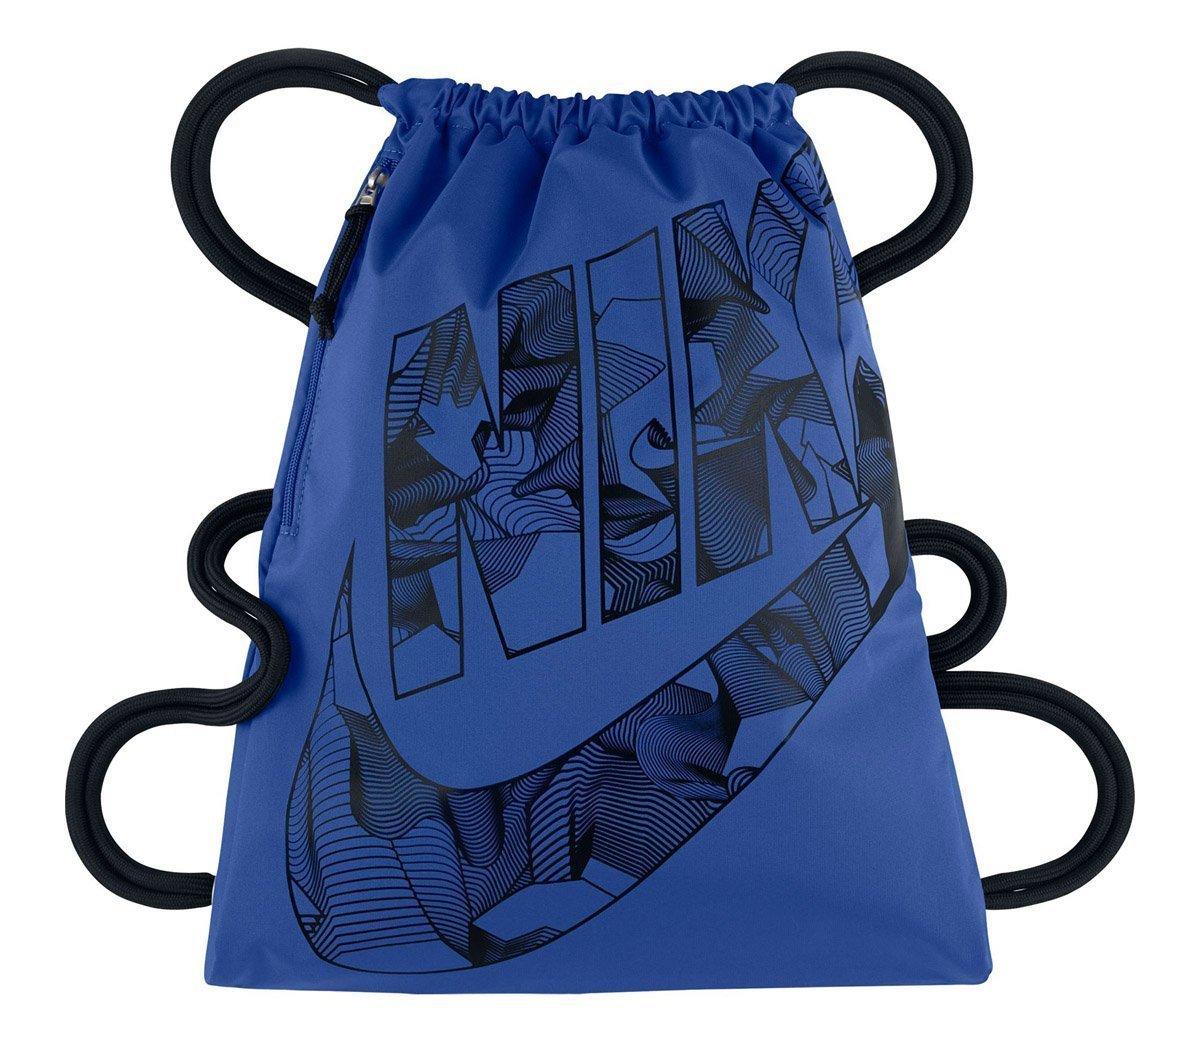 Nike Heritage Gymsack - Mochila para mujer, color azul, talla única BA5351-481